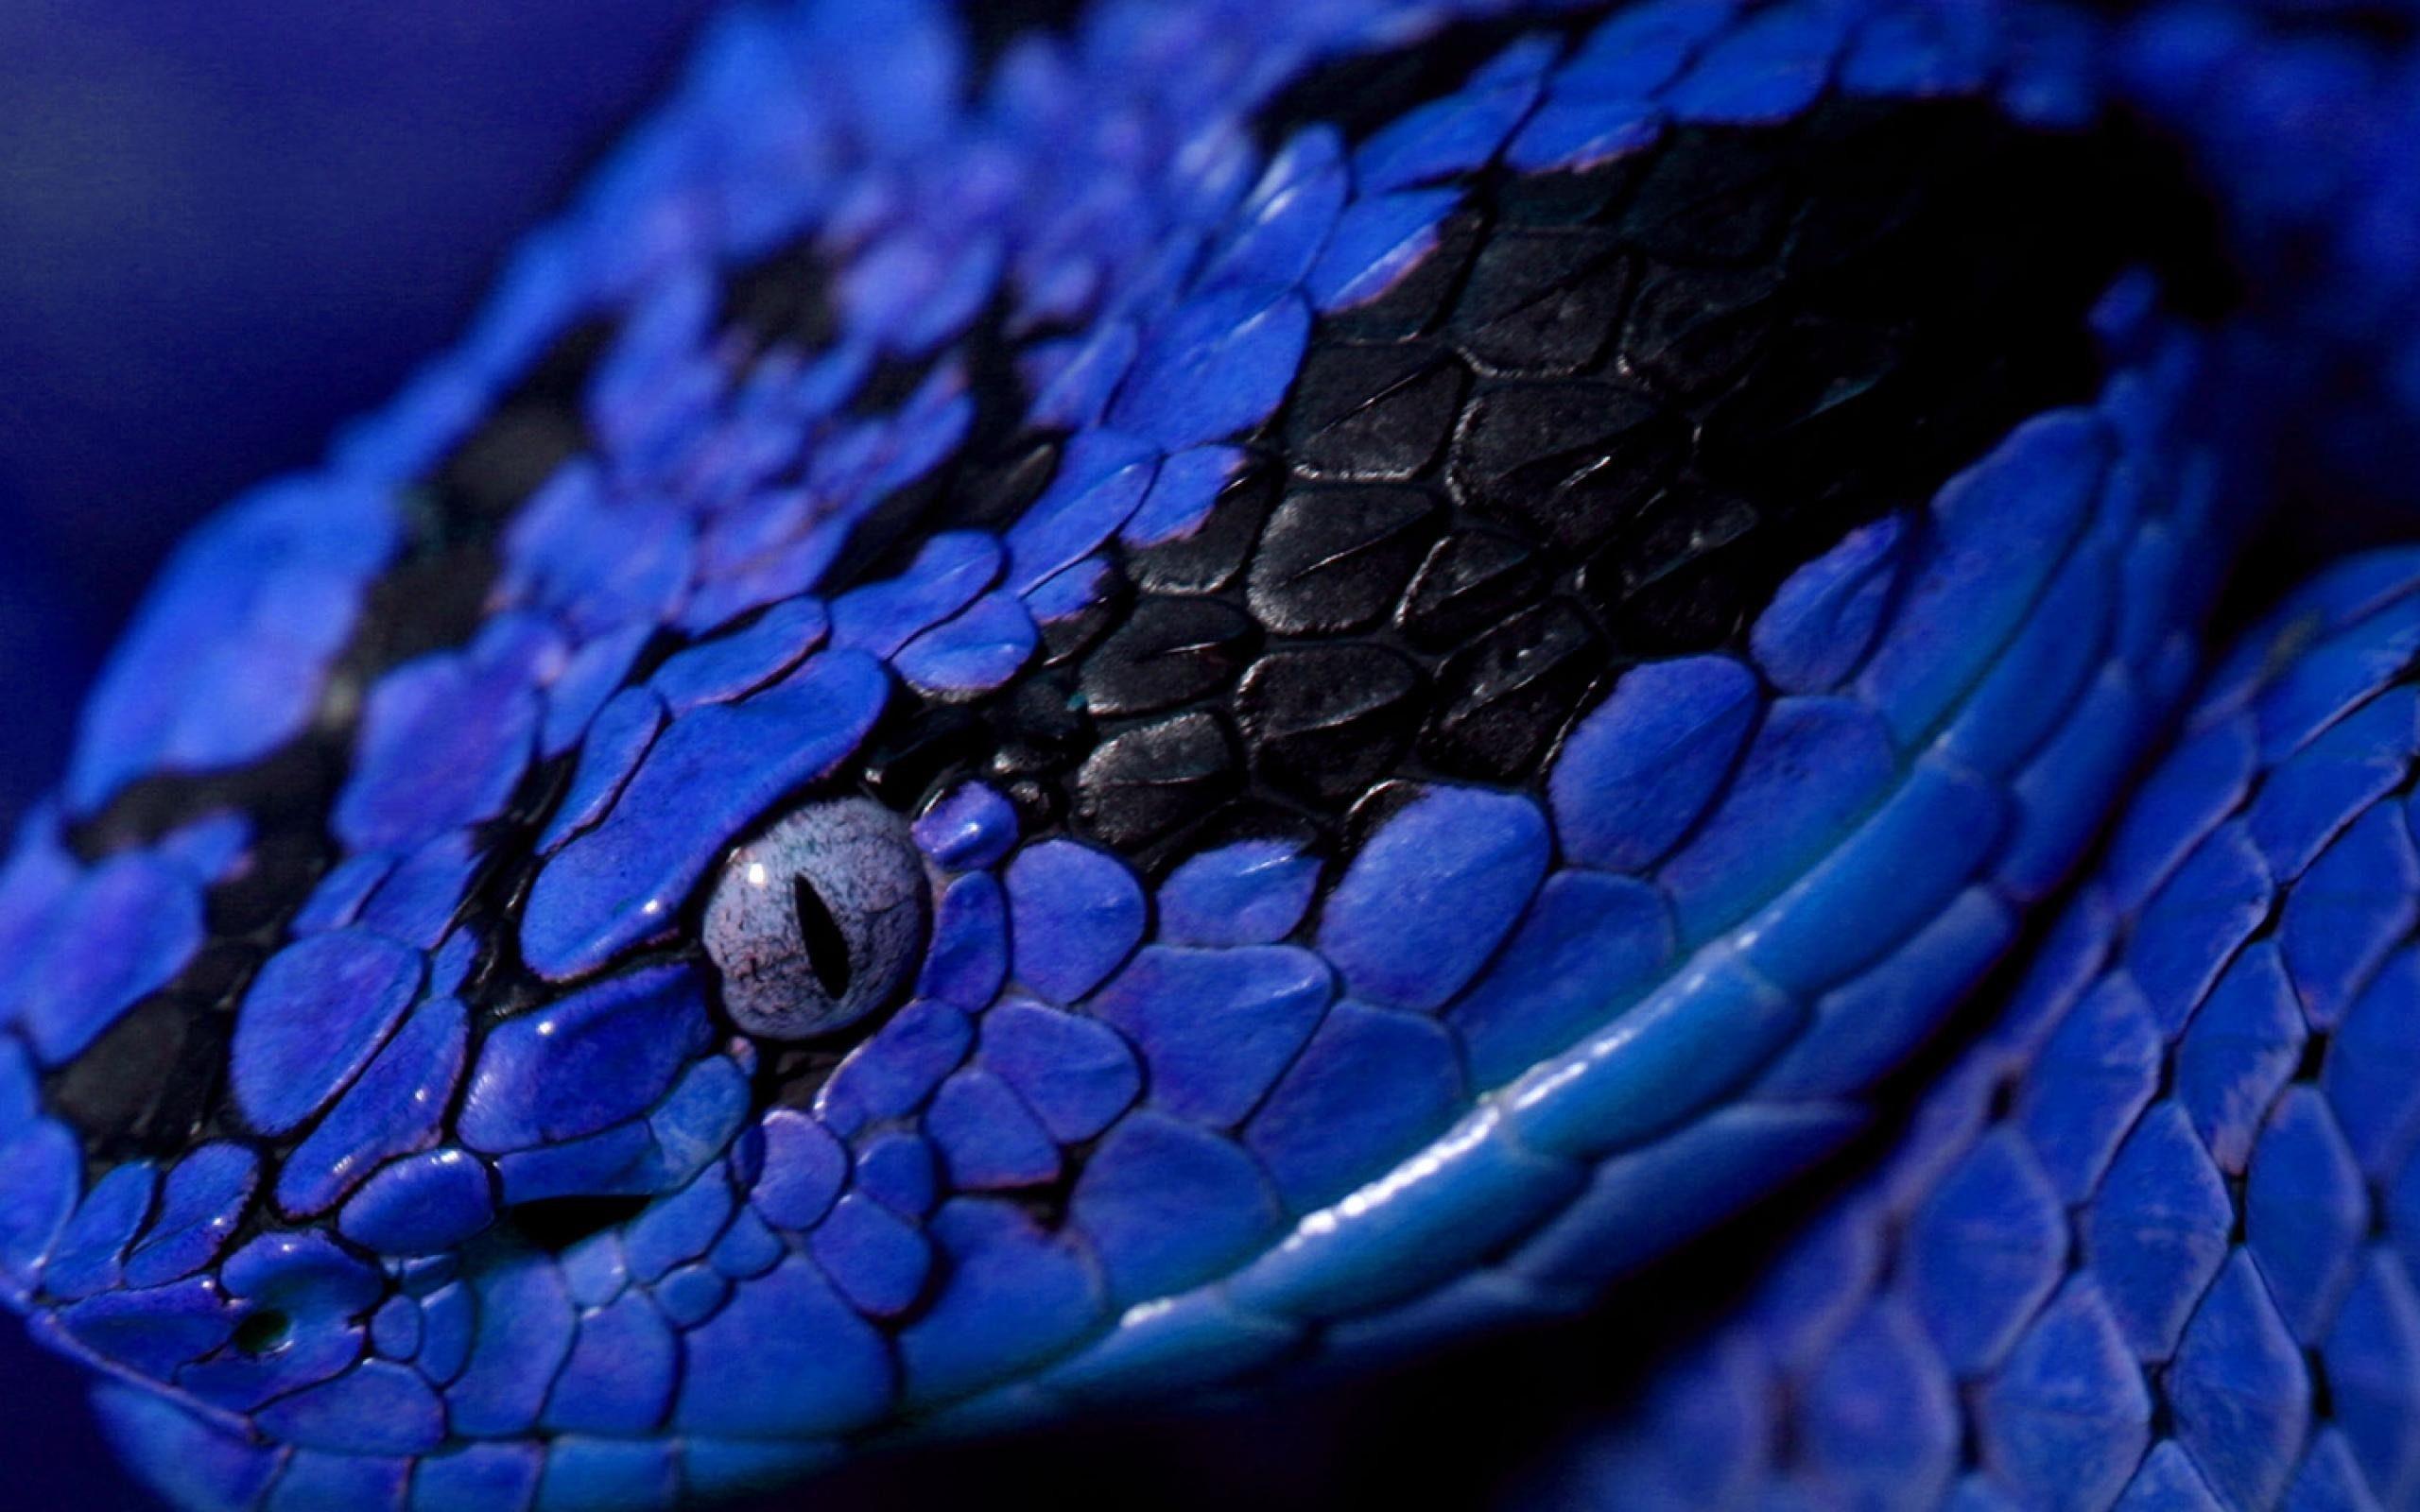 Viper Snake Backgrounds HD Schlangenbilder, Schöne